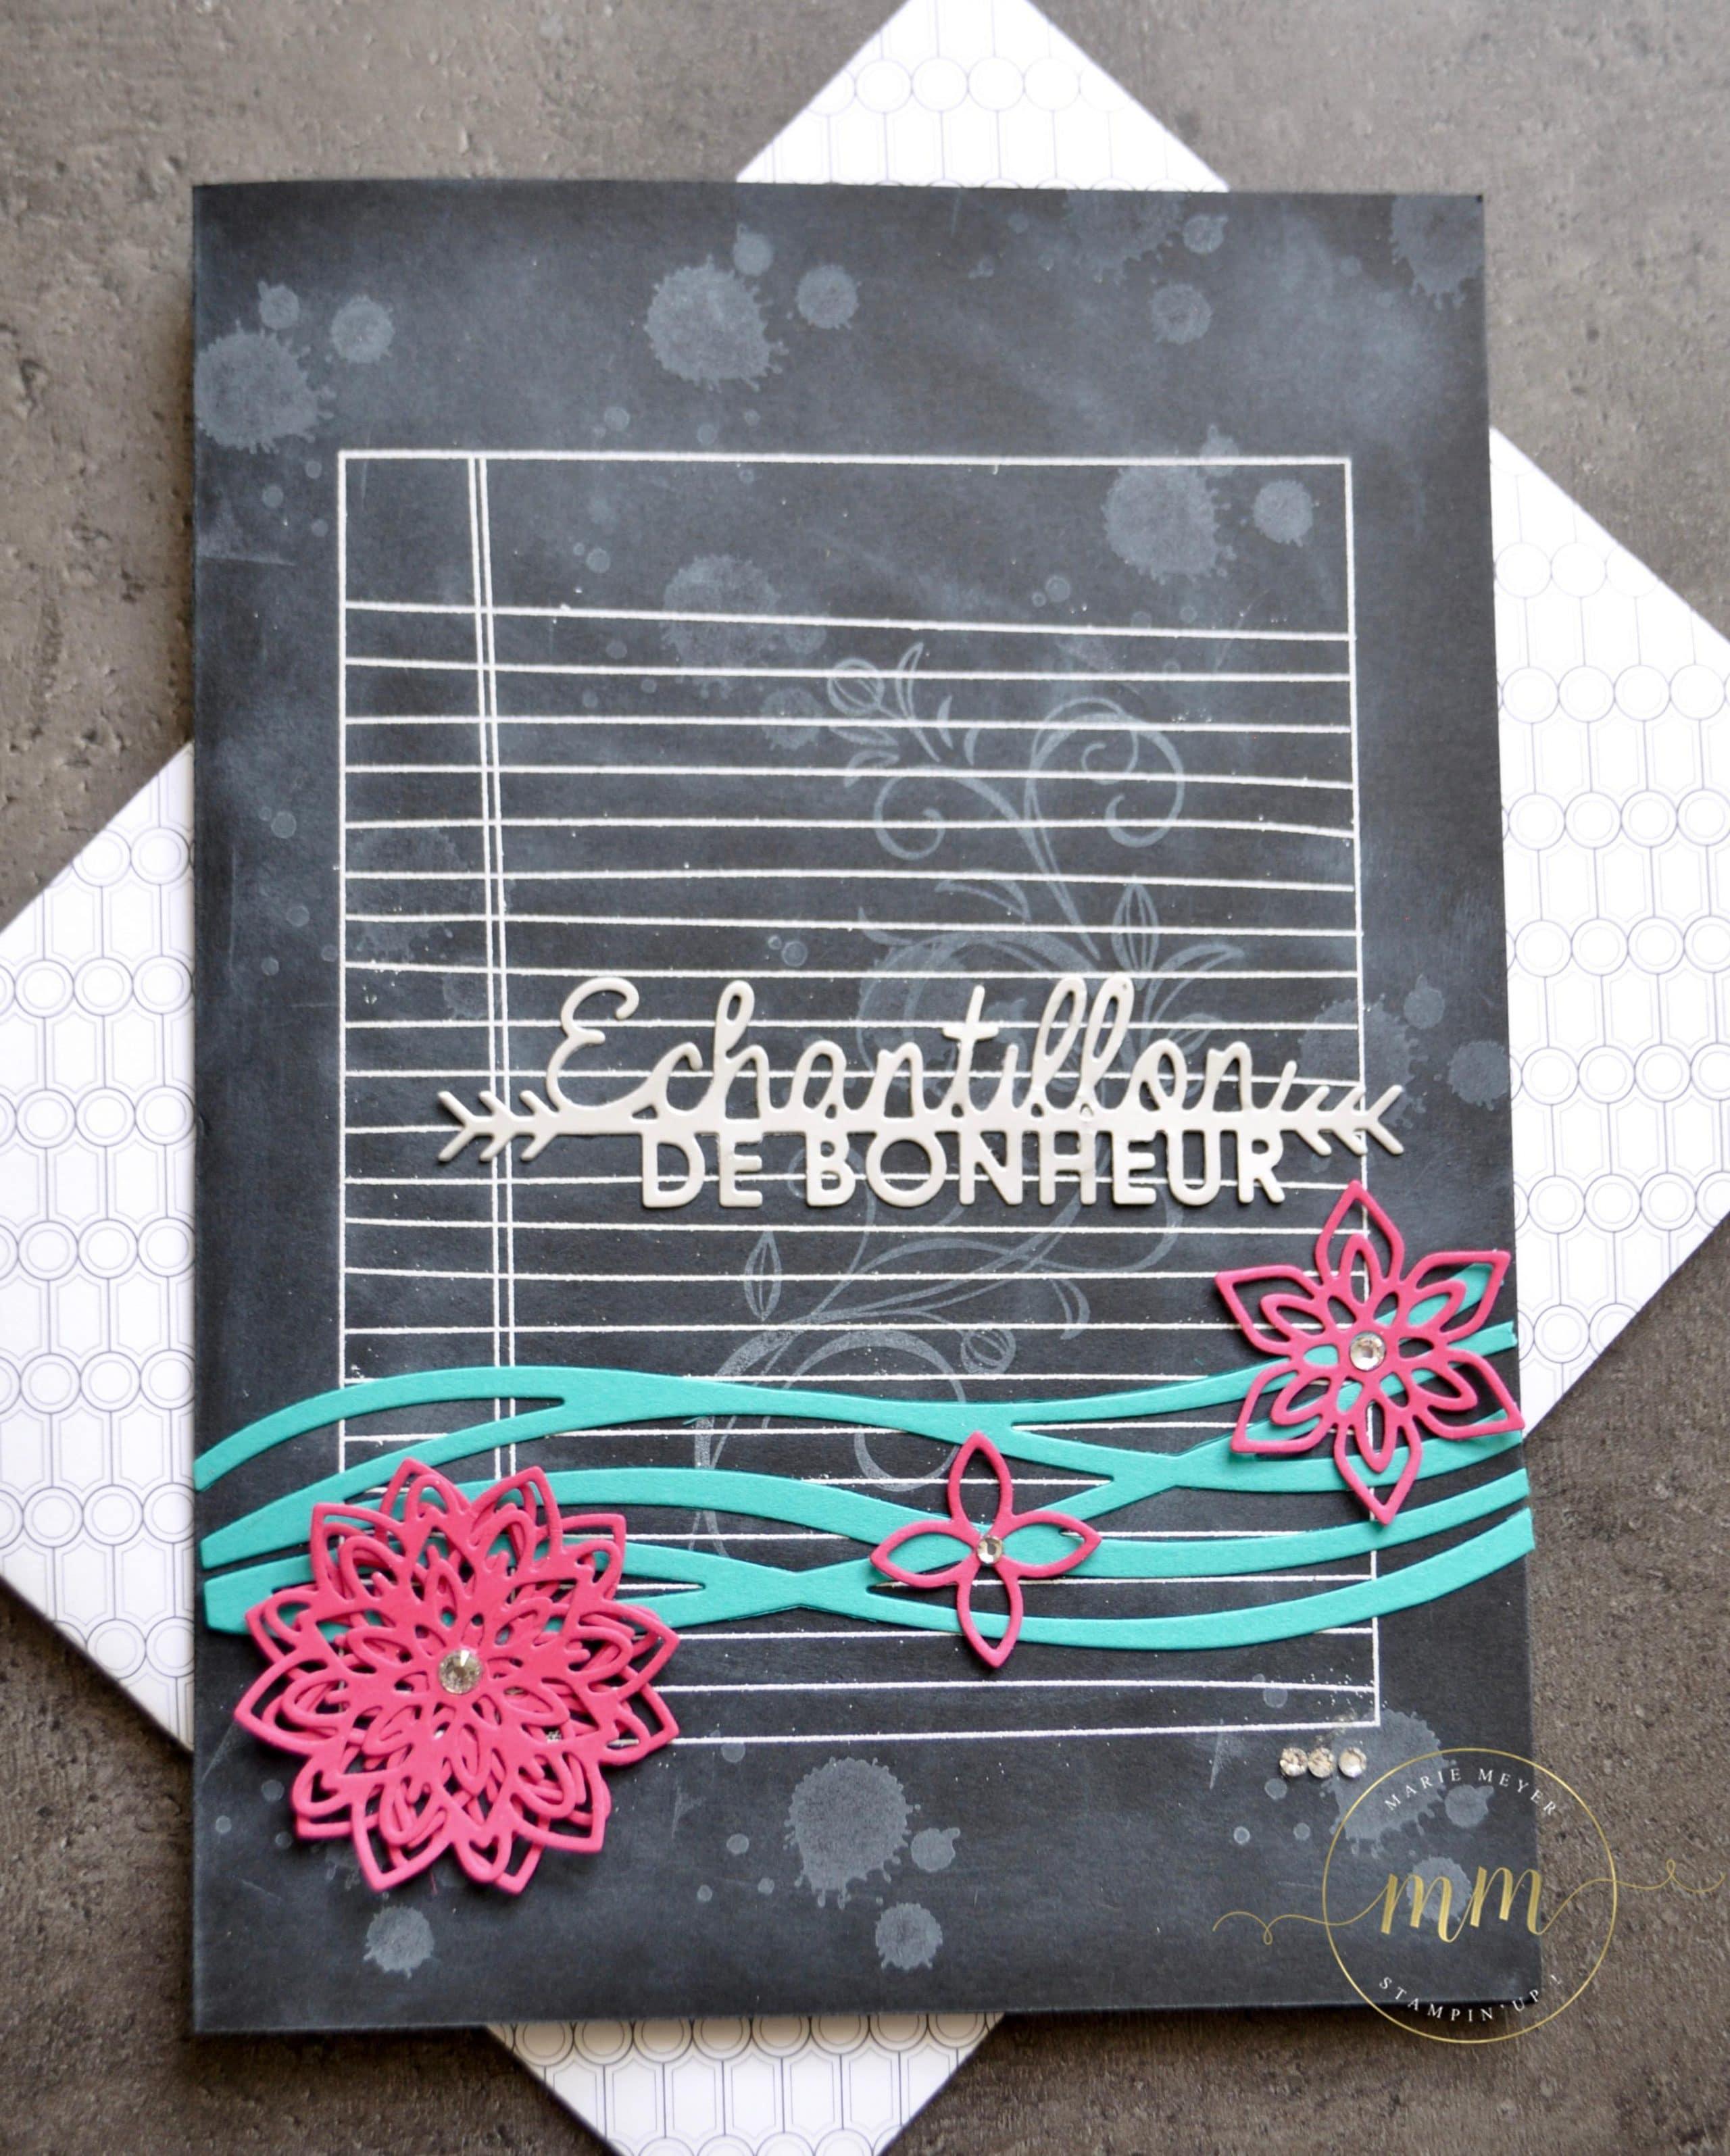 Carte de remerciement assistante maternelle tableau noir et Thinlits tourbillonnants par Marie Meyer Stampin up - http://ateliers-scrapbooking.fr/ - Swirly Scribbles Thinlits - Flourish Thinlits -Thinlits Wunderbar verwickelt - Thinlits Blütenpoesie